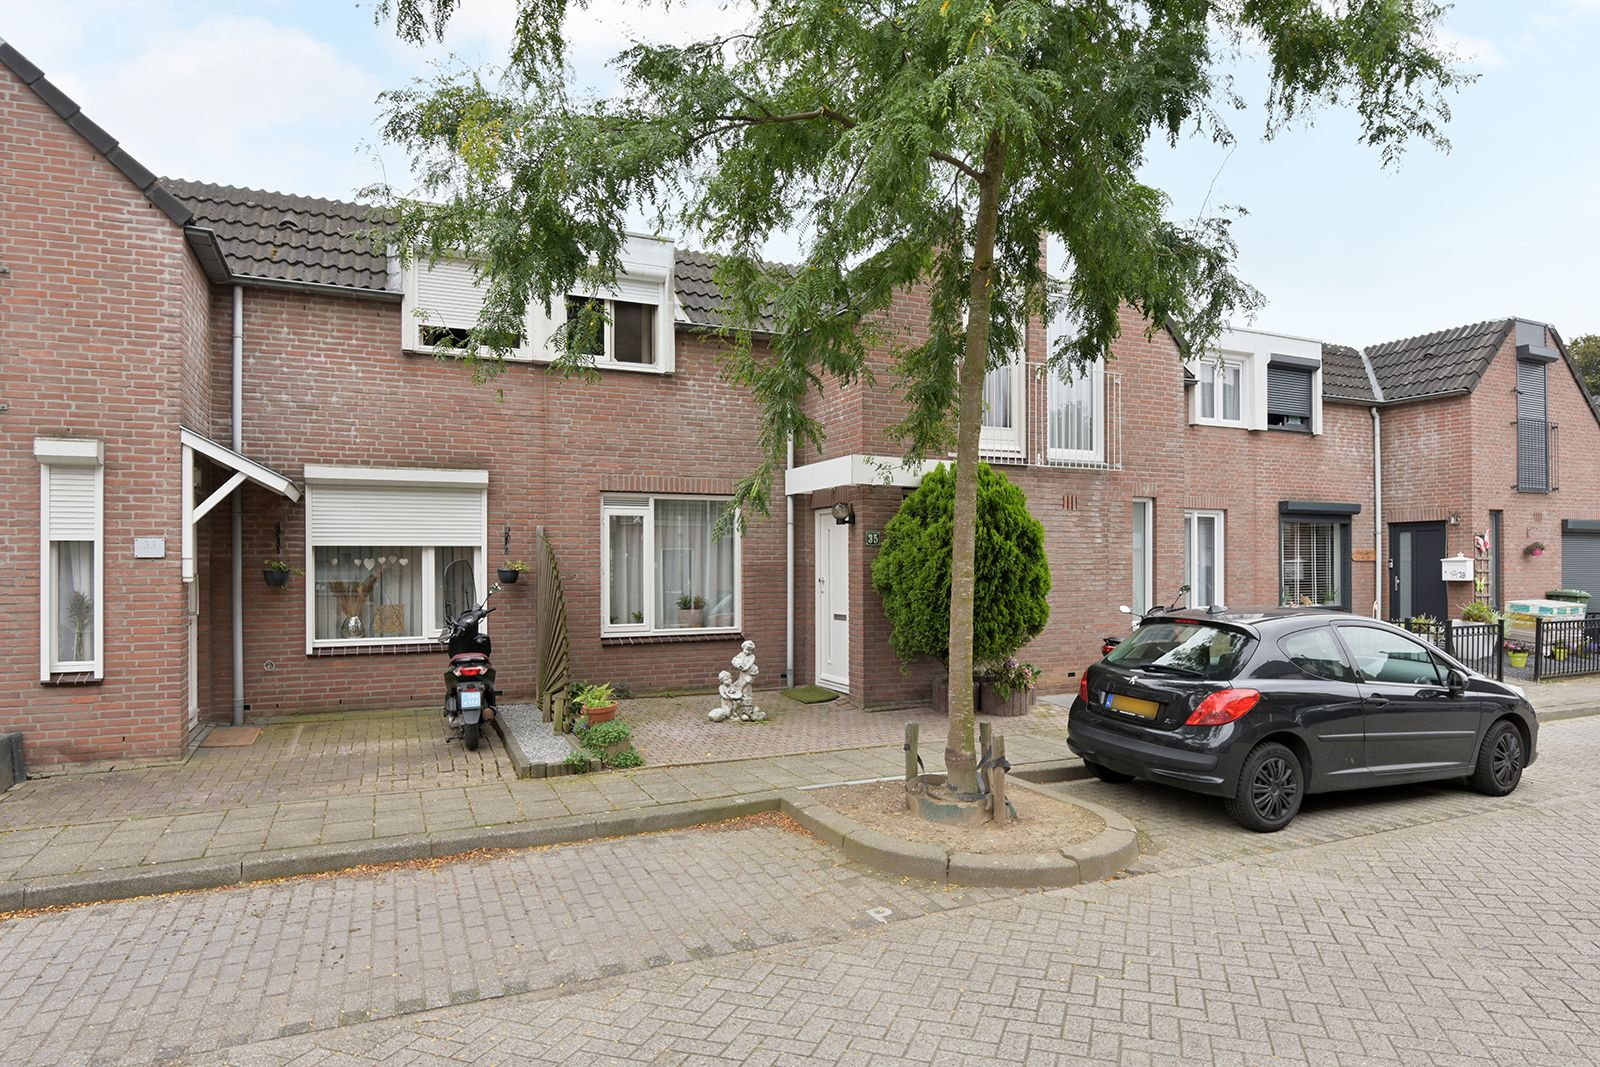 Albertusstraat 35, Maastricht